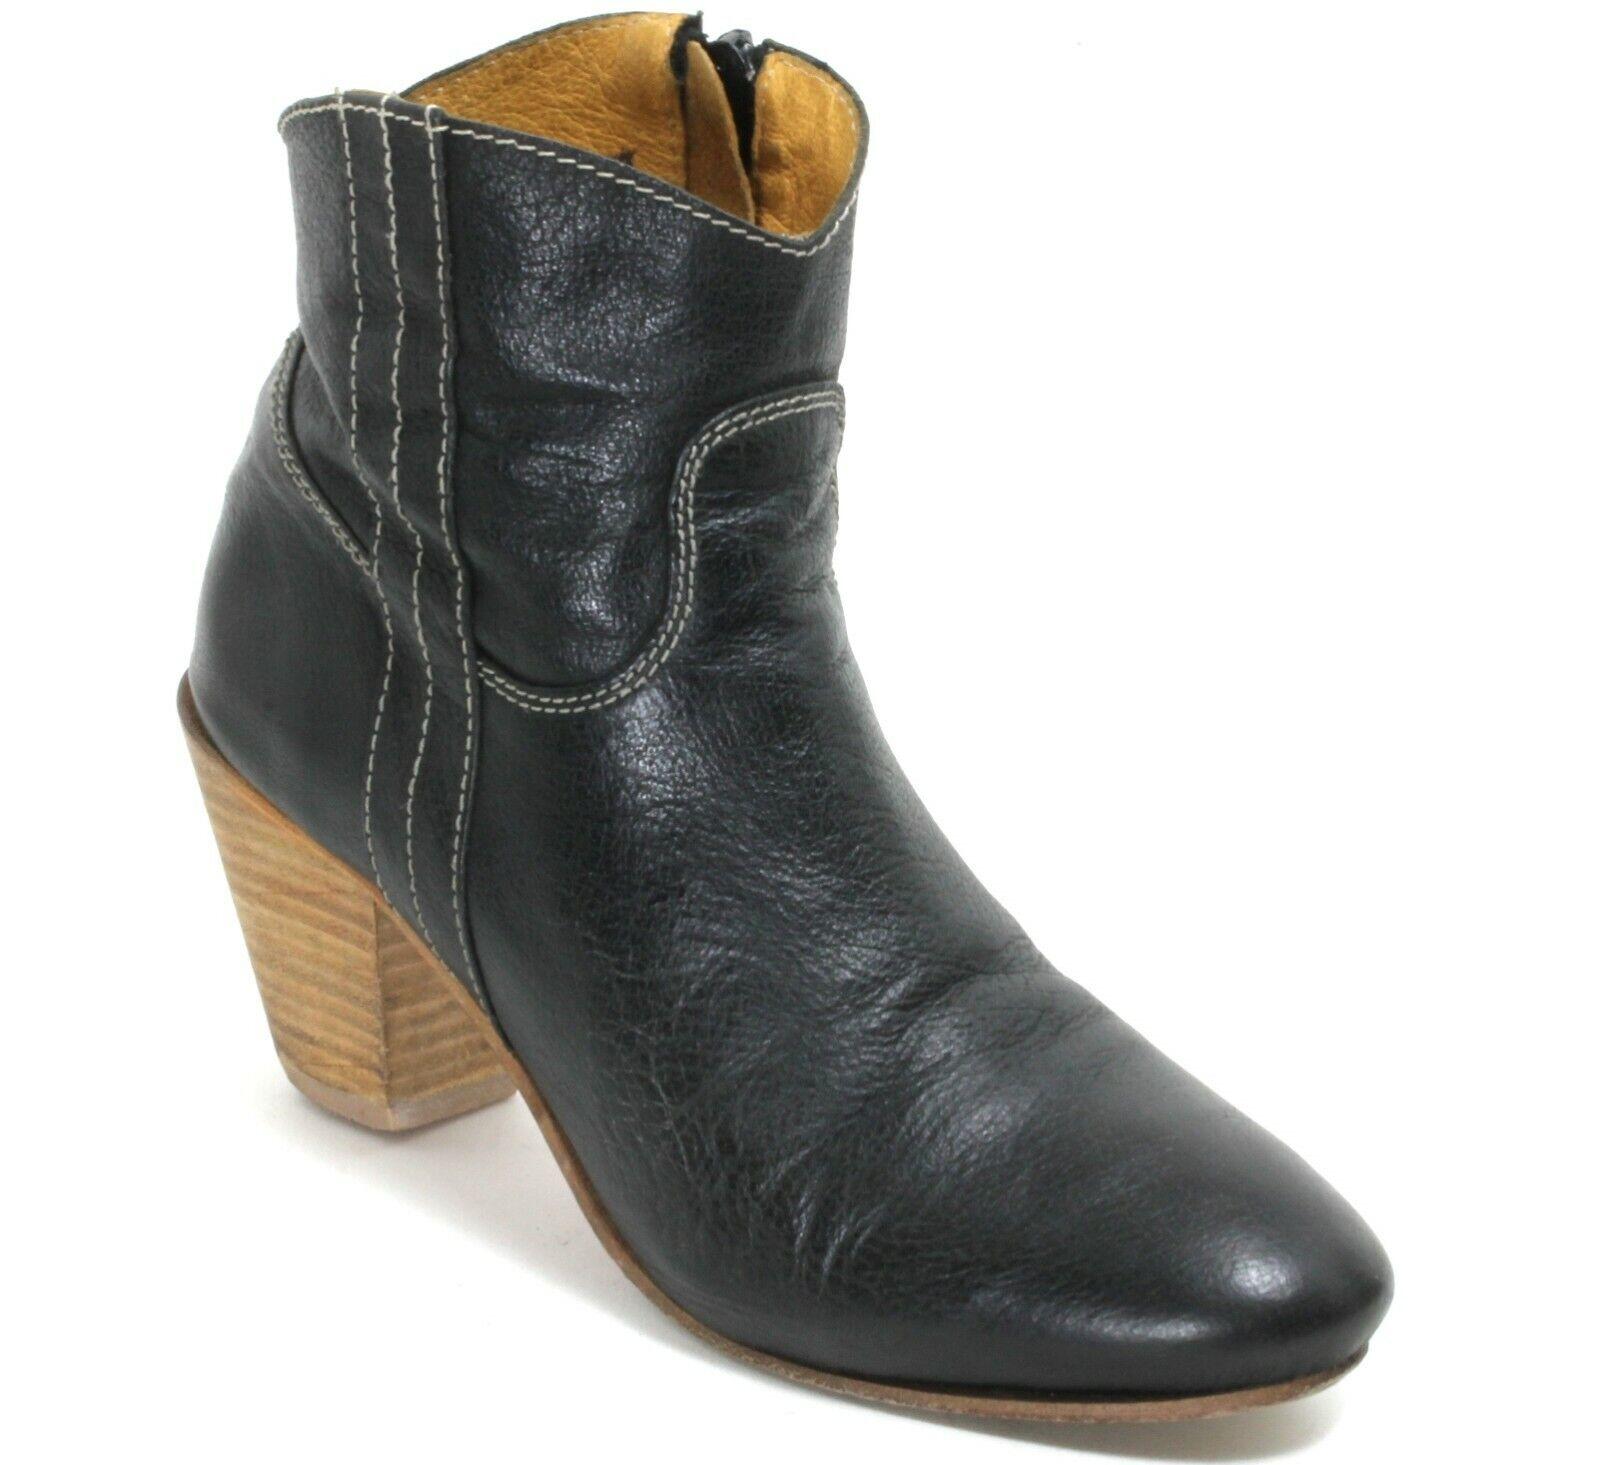 Bottes Femmes Vintage Bottine Chaussures Basses Chelsea Zipper DMN Western Chaussures 40